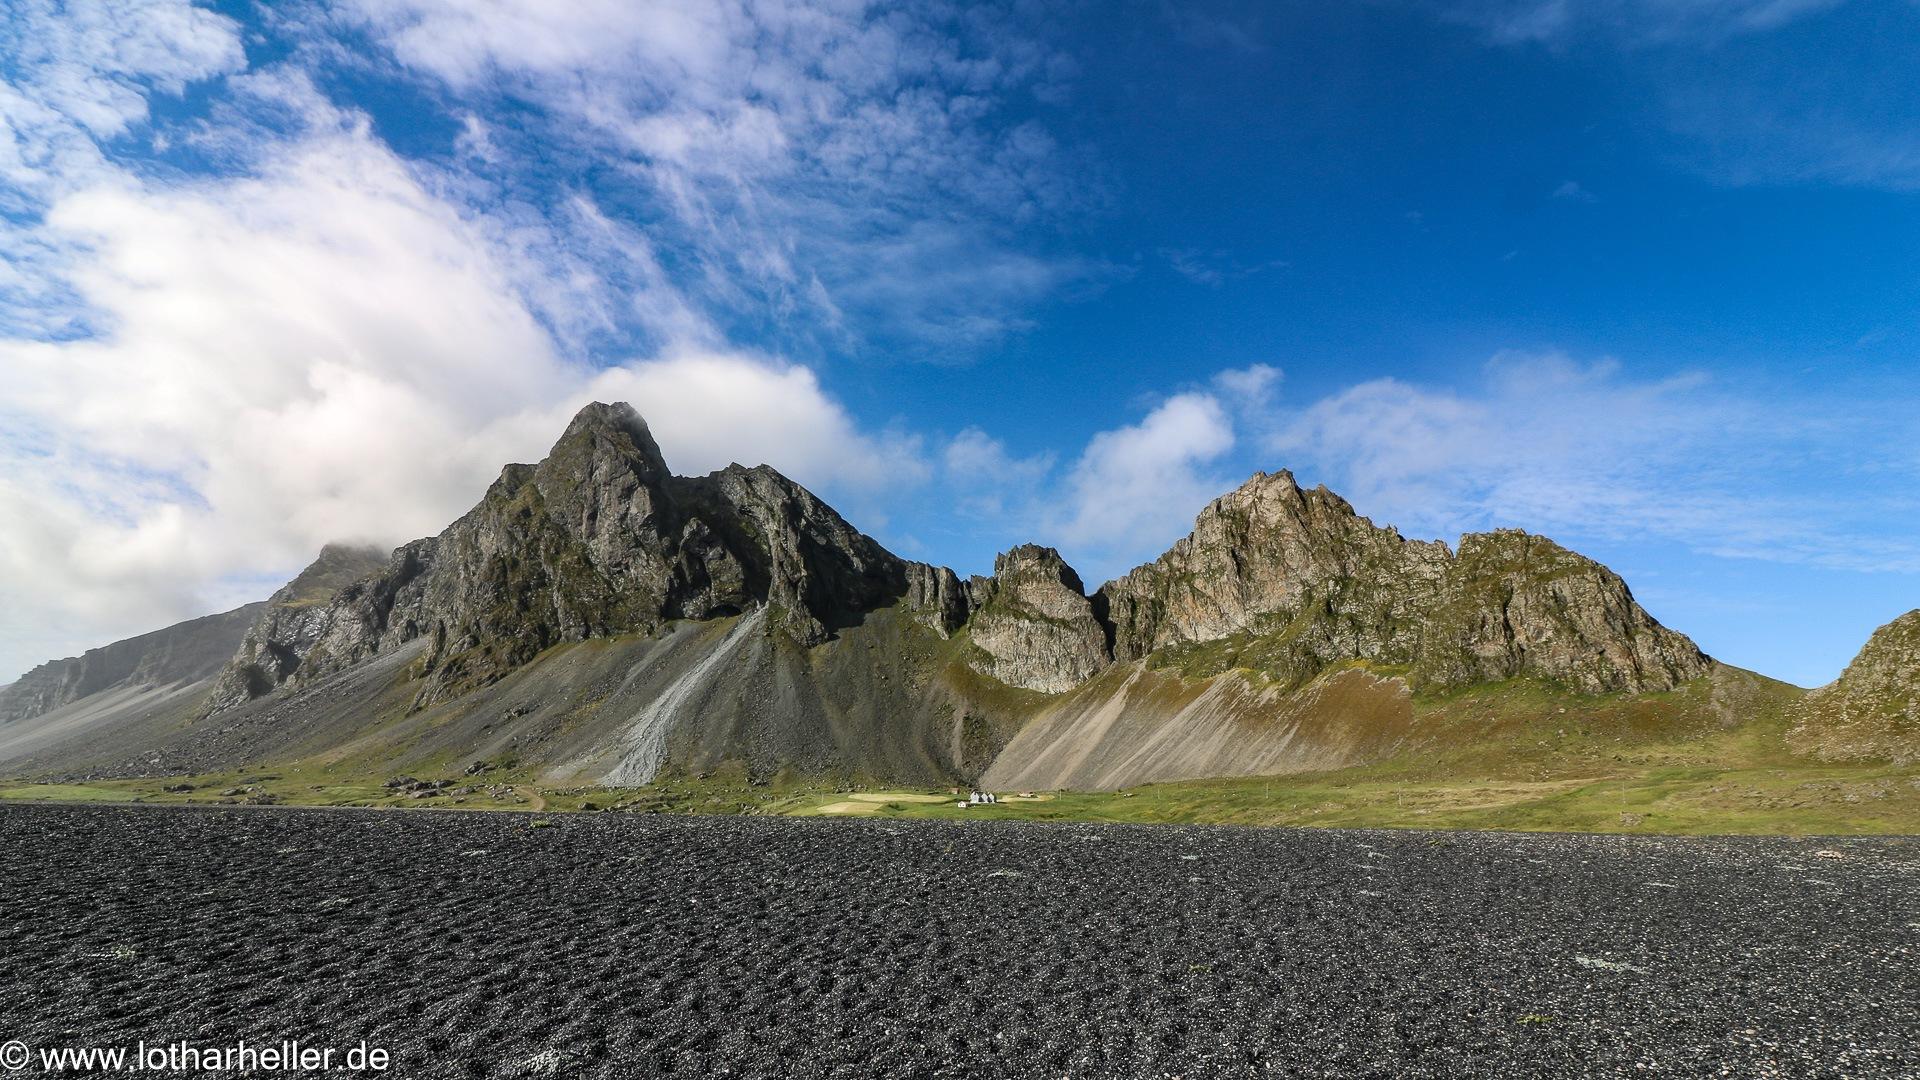 Iceland by Lothar Heller